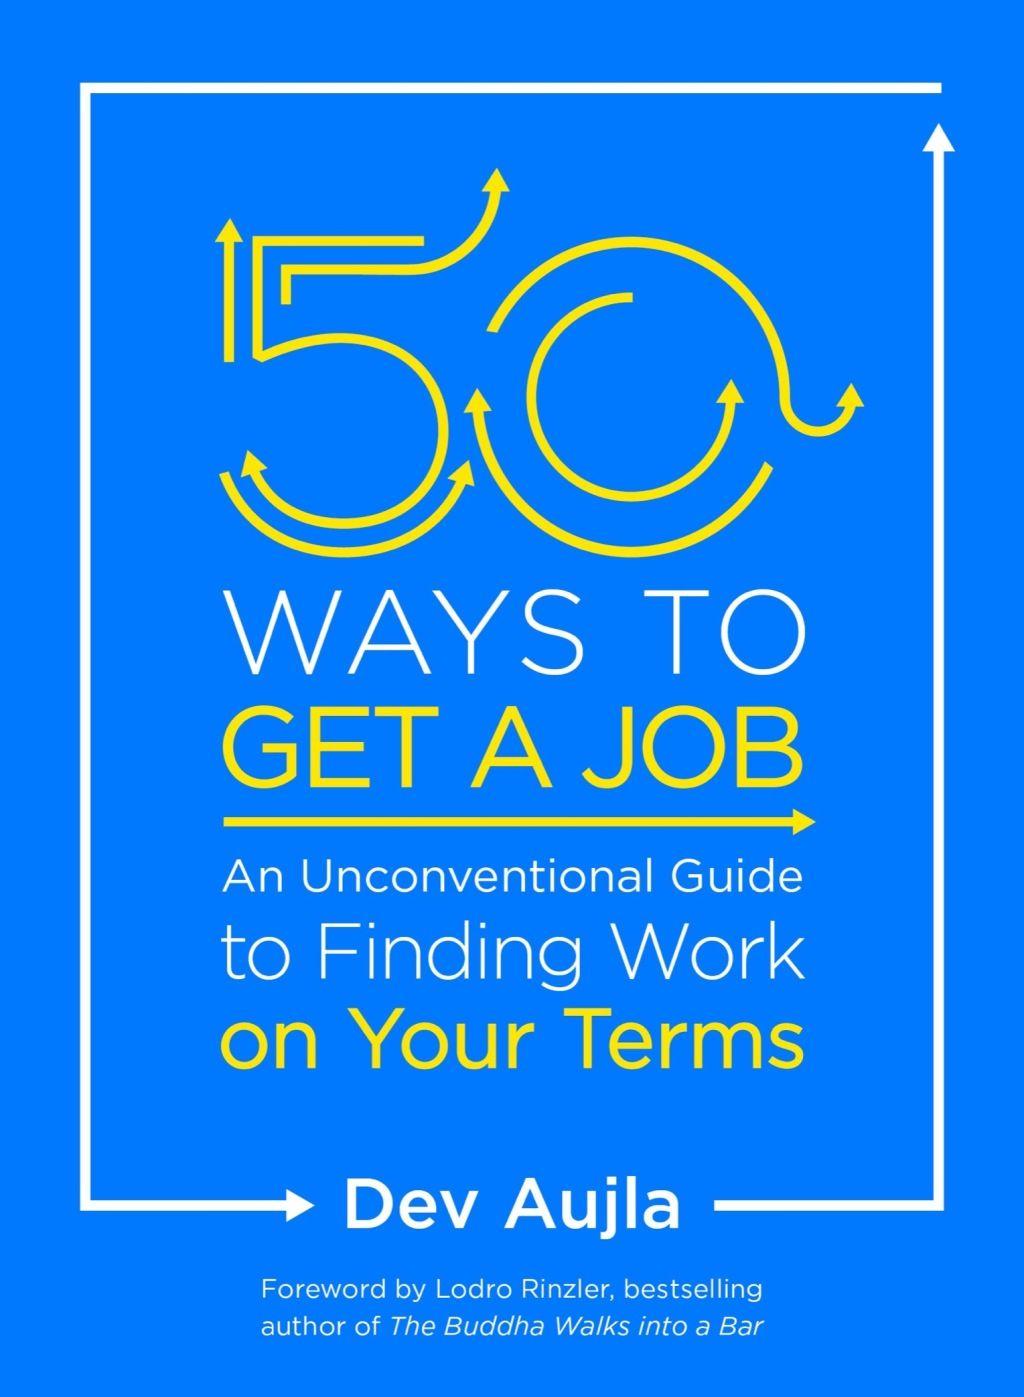 50 Ways to Get a Job (eBook) Find work, Good new books